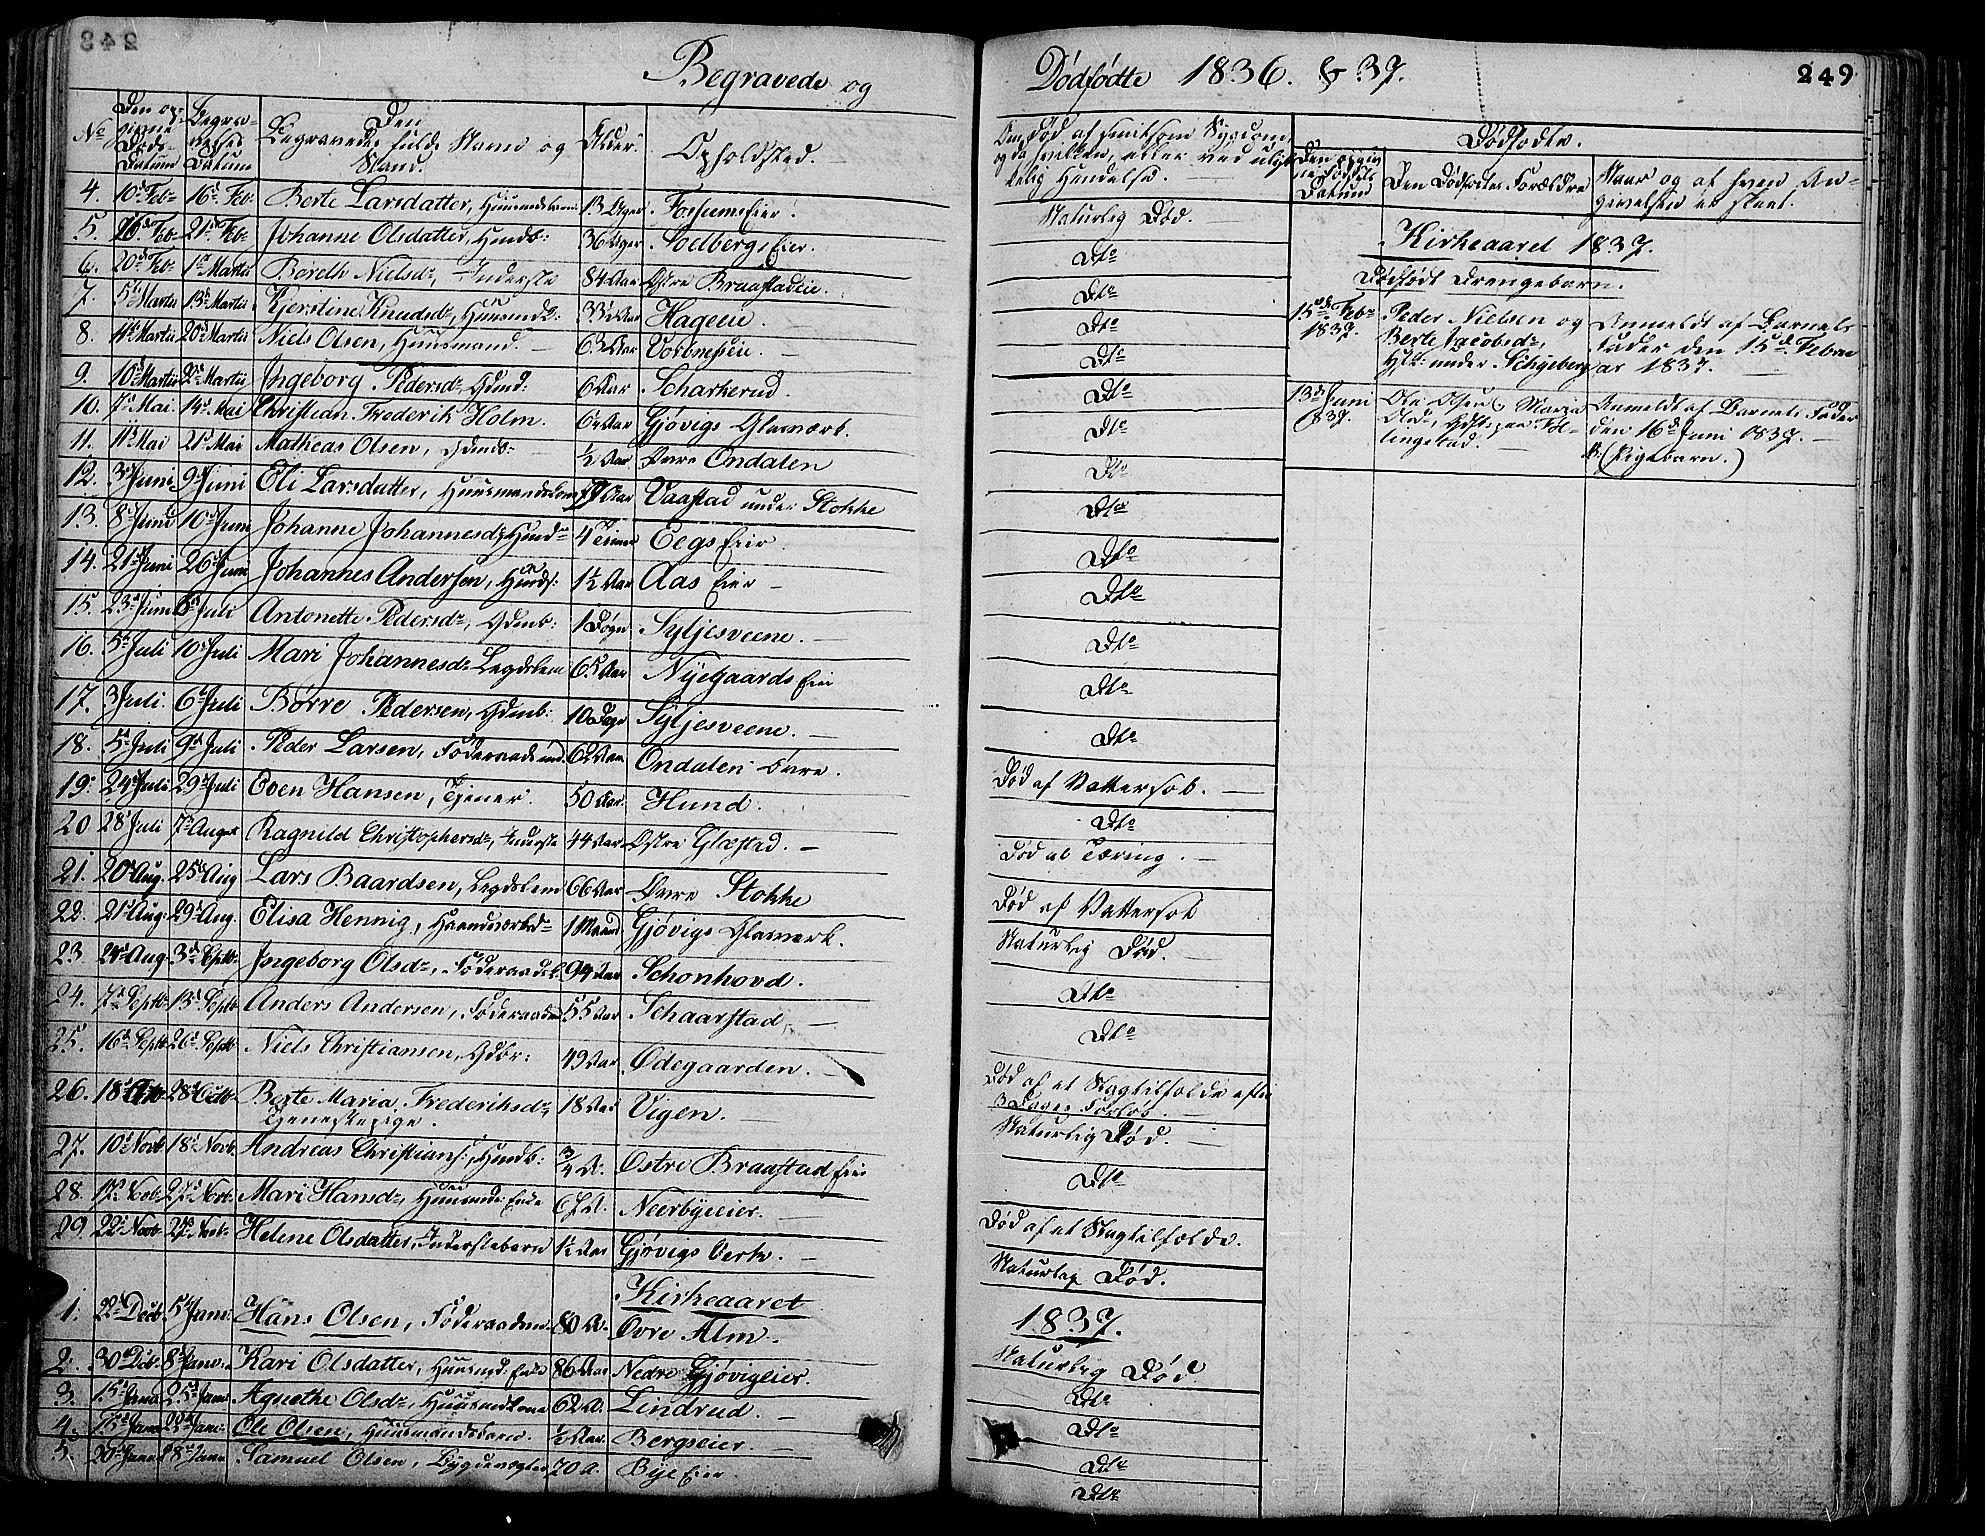 SAH, Vardal prestekontor, H/Ha/Hab/L0004: Klokkerbok nr. 4, 1831-1853, s. 249